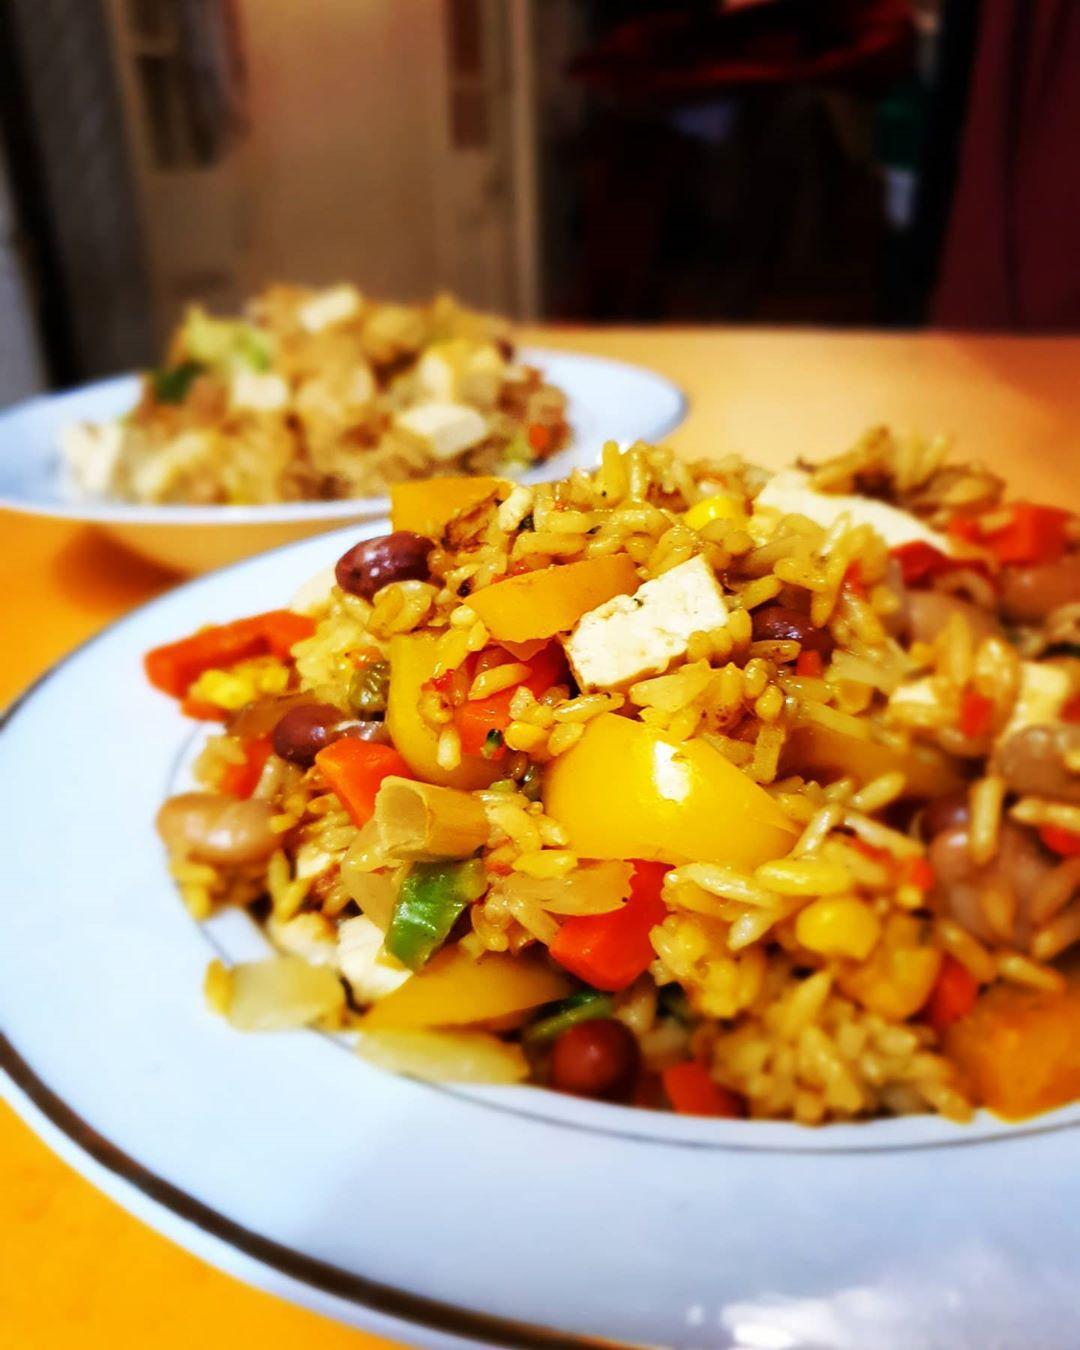 55 Cheap And Easy Dinner Recipes You Need Try,#quickdinner#dinnerinspo#dinneridea#easymeals#weeknightdinner#dinnerrecipe#cauliflower#lovetocook#whatsonmyplate#chickenrecipes